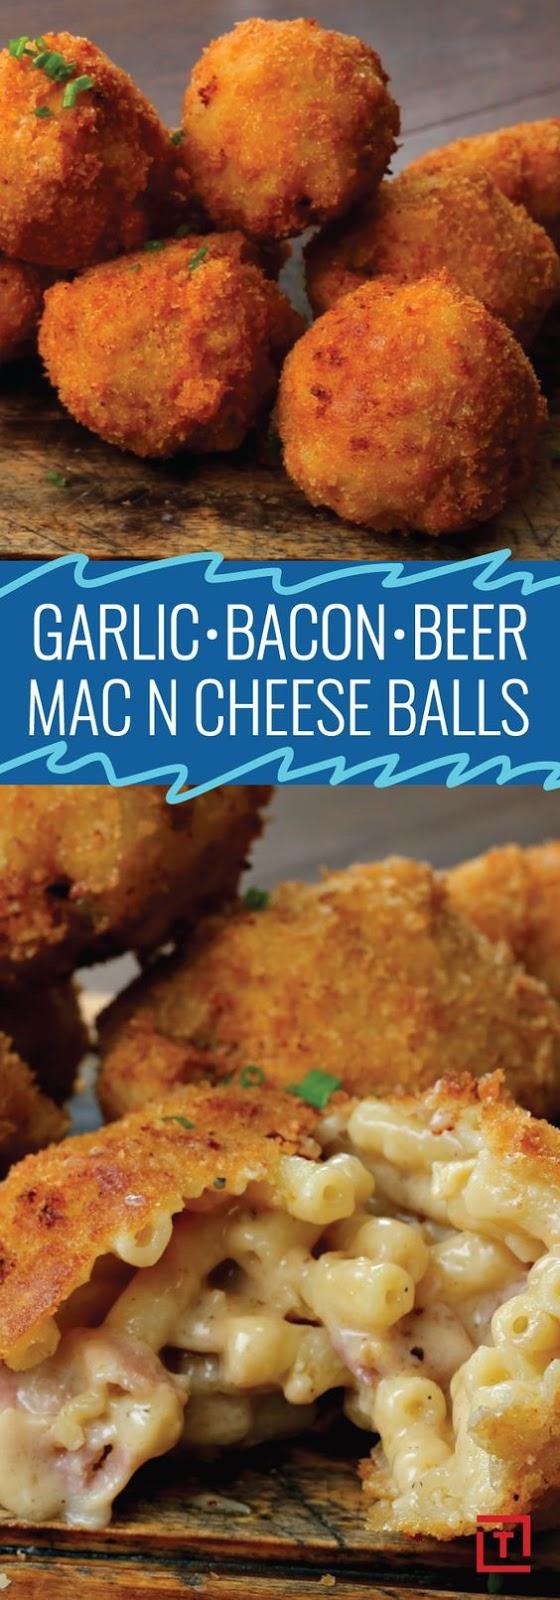 Small Snack, Big Flavor: Garlic, Bacon, and Beer Mac & Cheese Balls